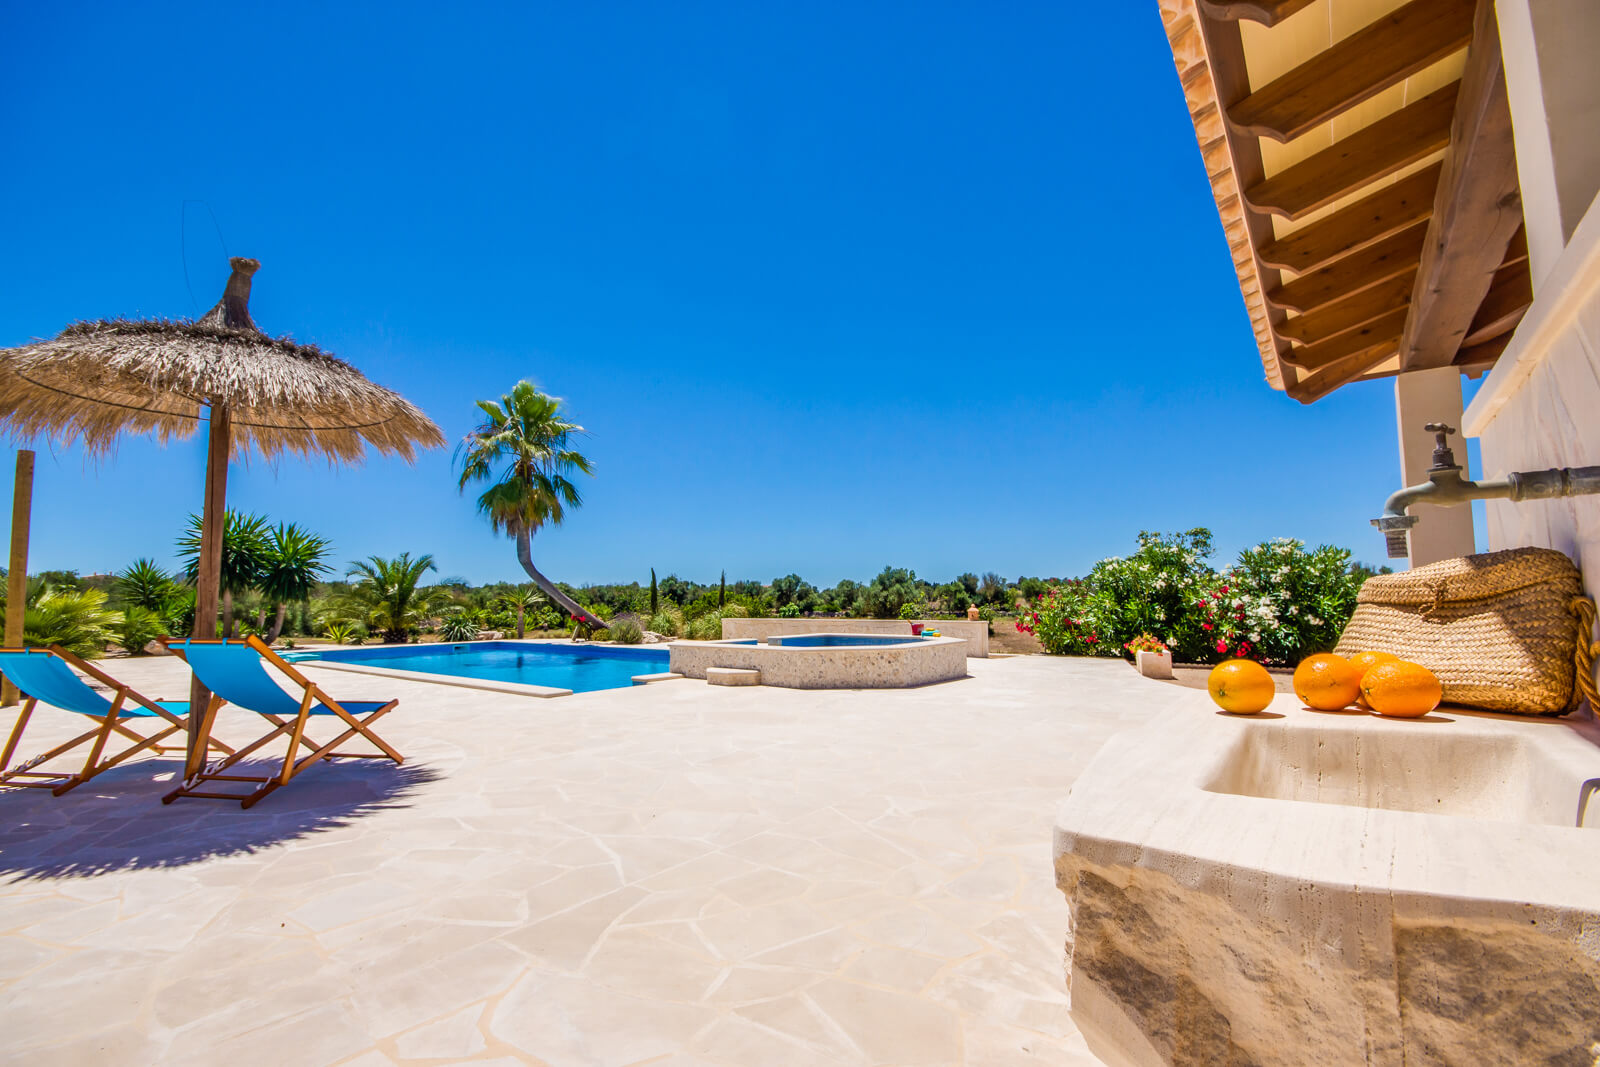 Finca Anima Terrasse mit Blick auf den Pool